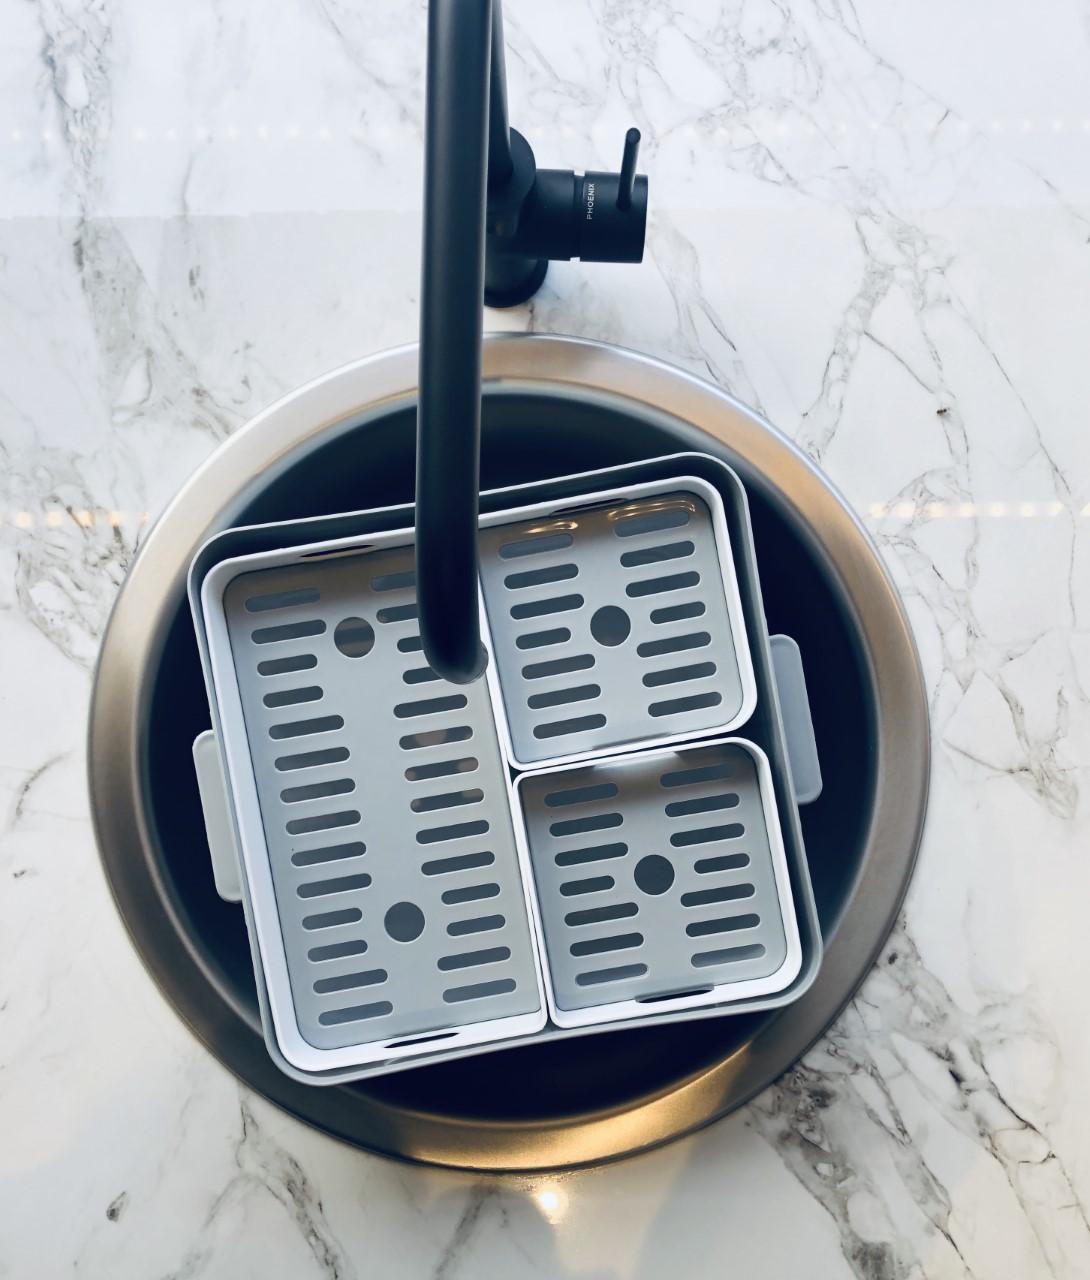 Soka Tub laundry soaking system fits in round sinks